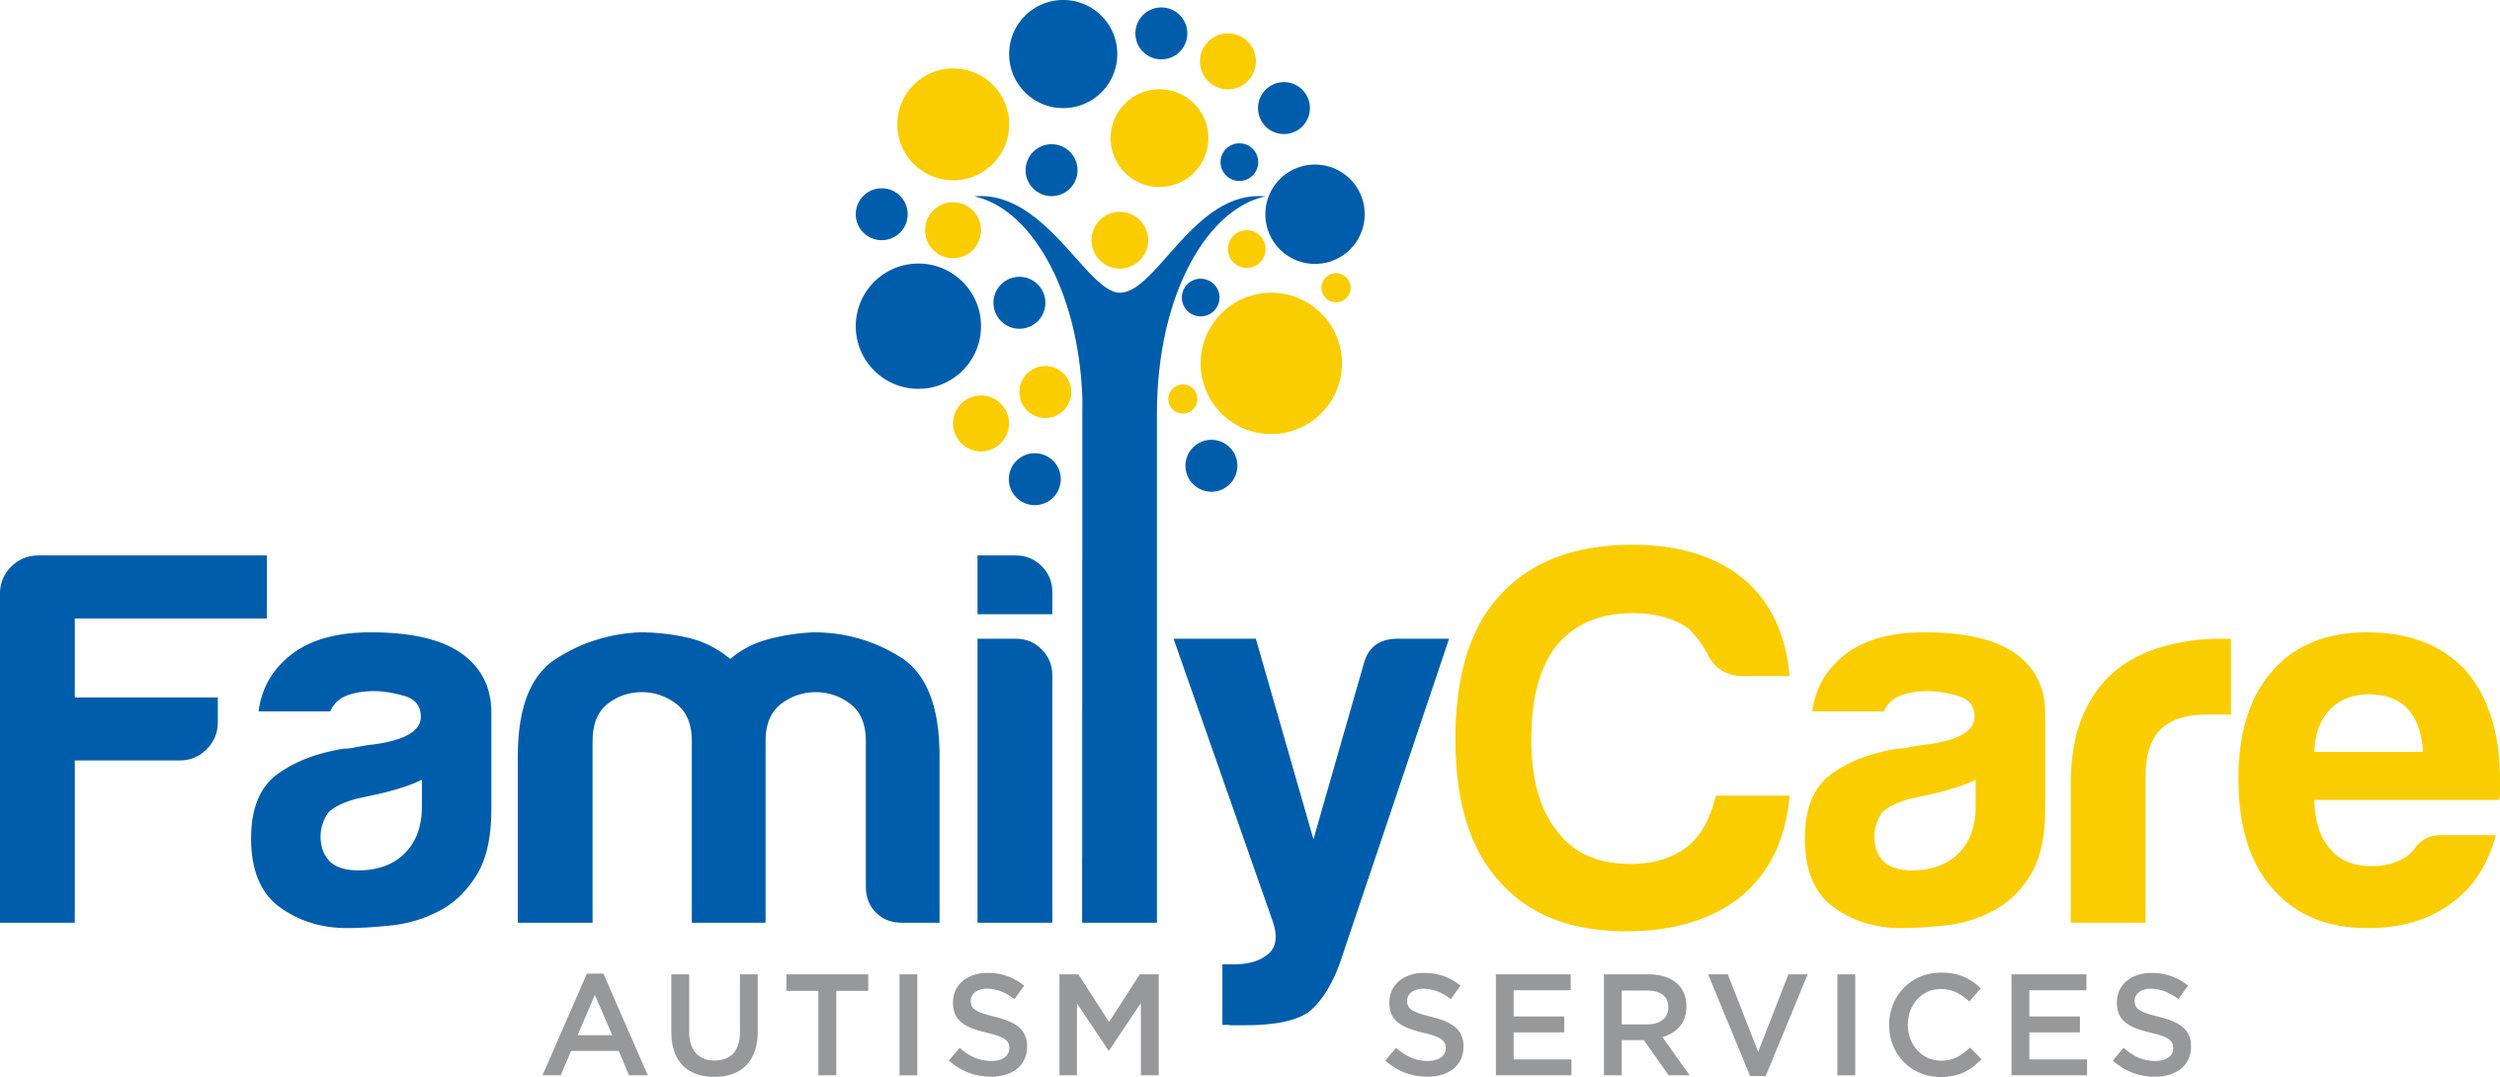 FamilyCare AutismServices.jpg